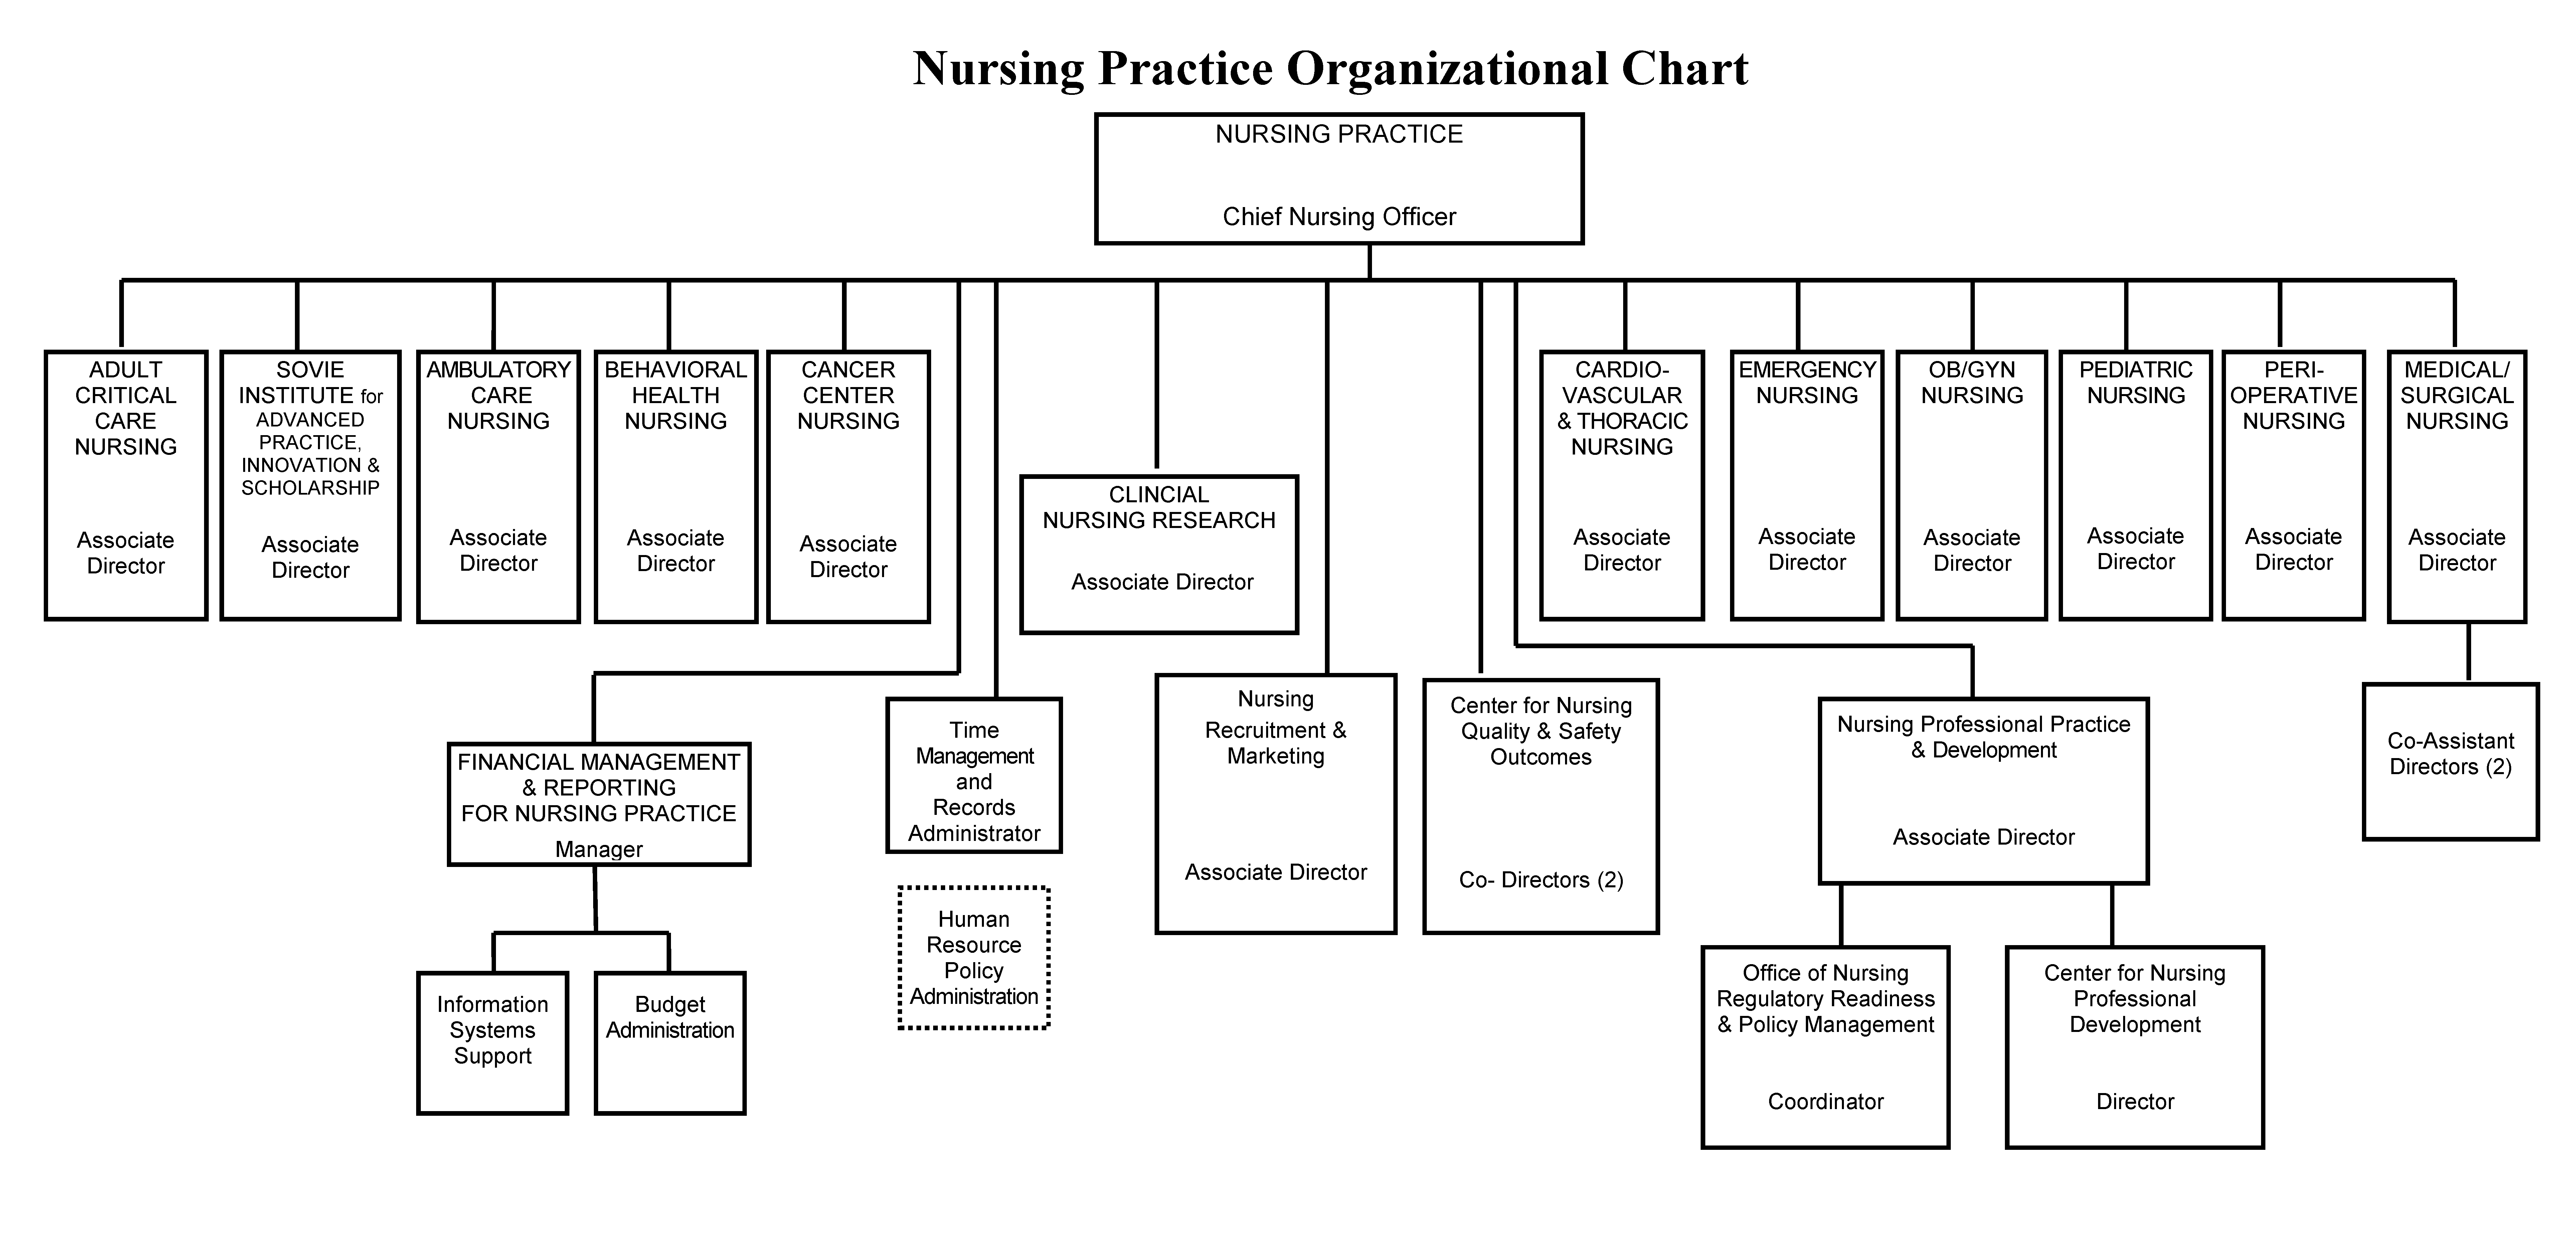 Nursing Practice Organizational Chart.aspx?width=600&height=289 organizational chart nursing at strong memorial hospital